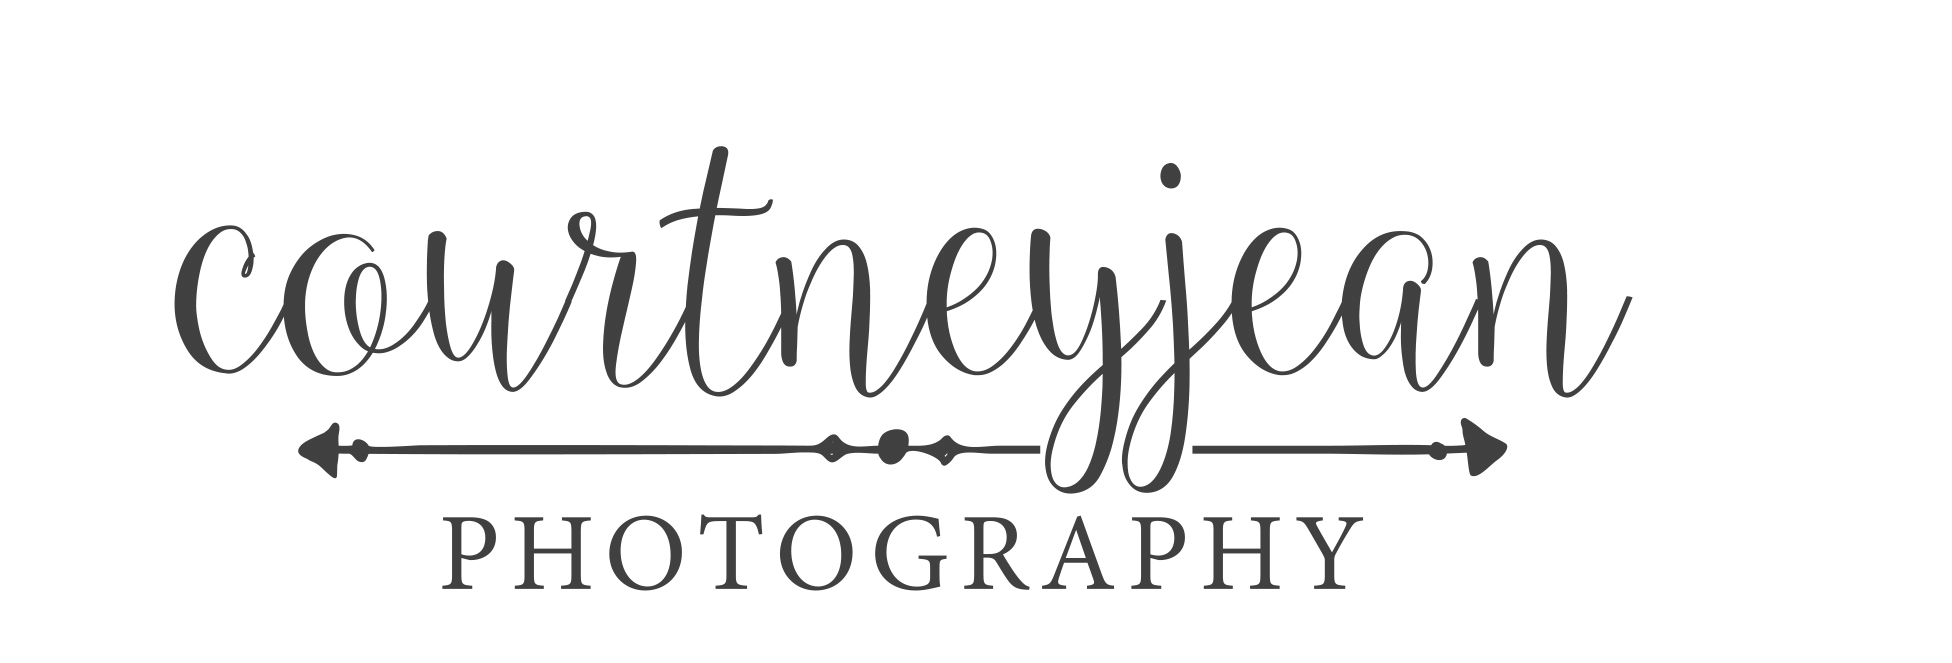 Courtney Jean Photography